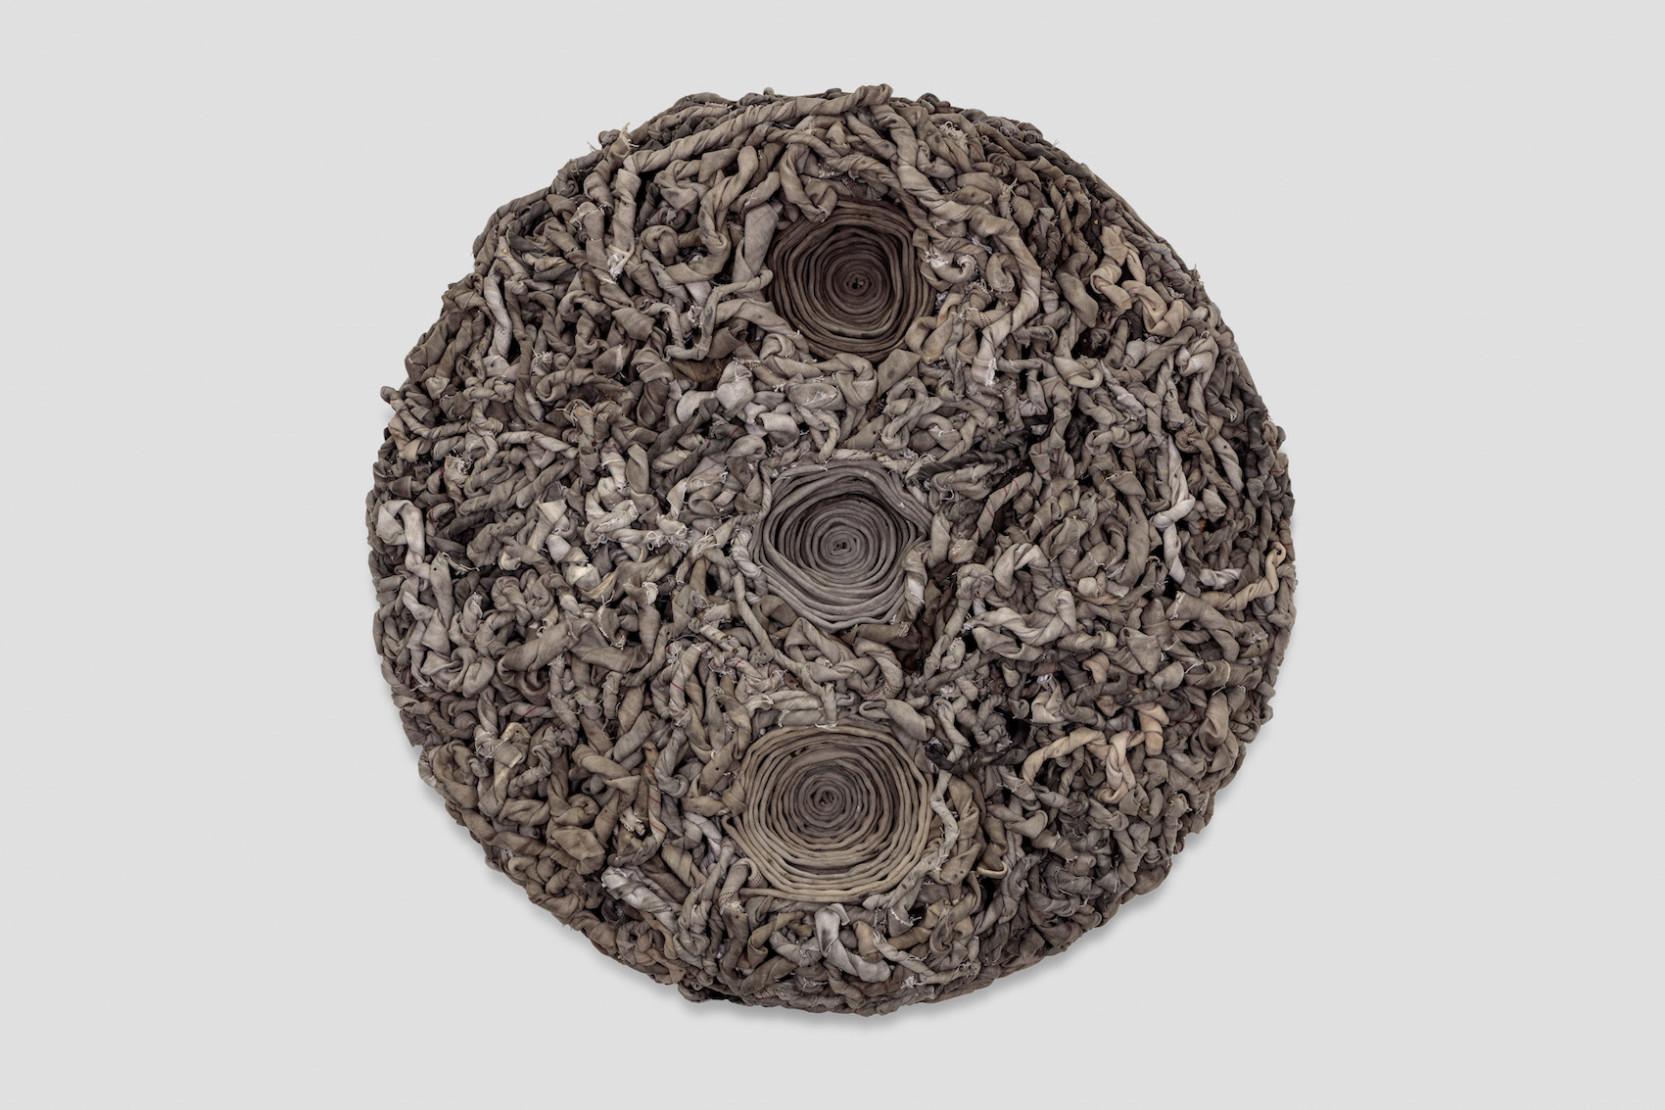 circular sculpture wall piece made of found materials by nari ward